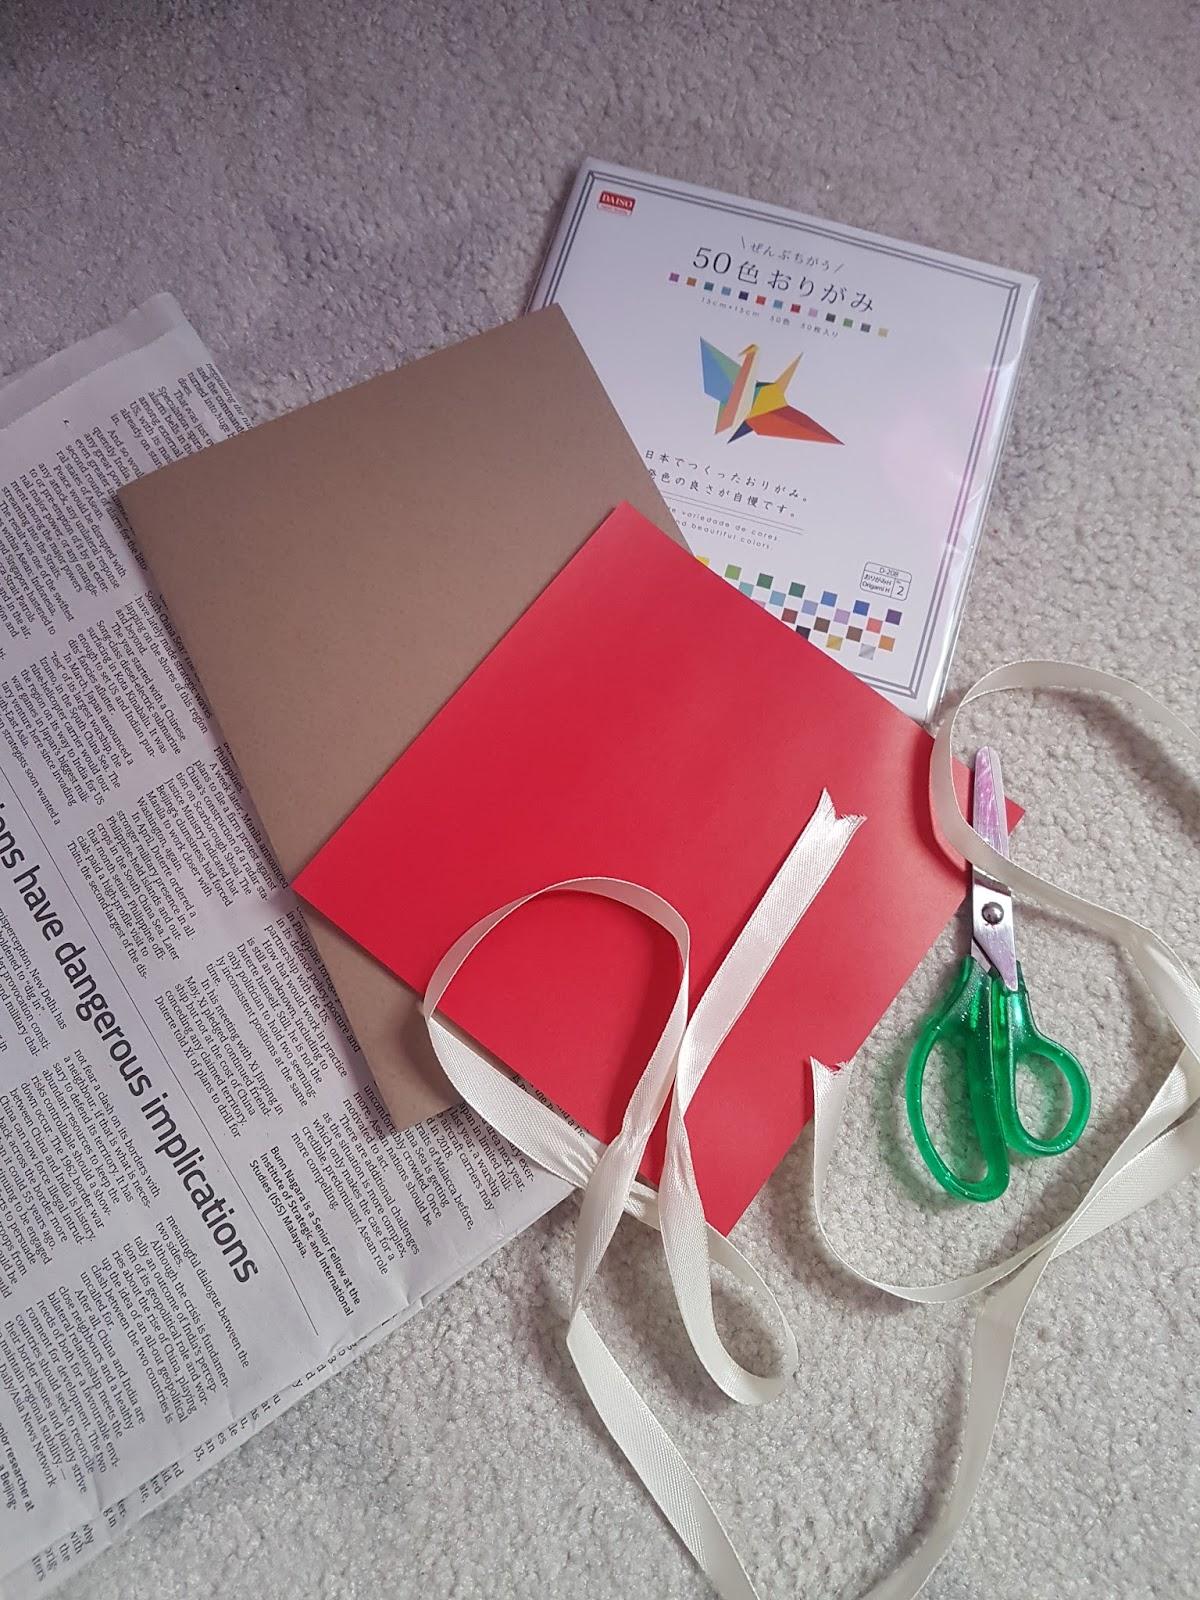 Ummis Bucket List Make A Handmade Greeting Card